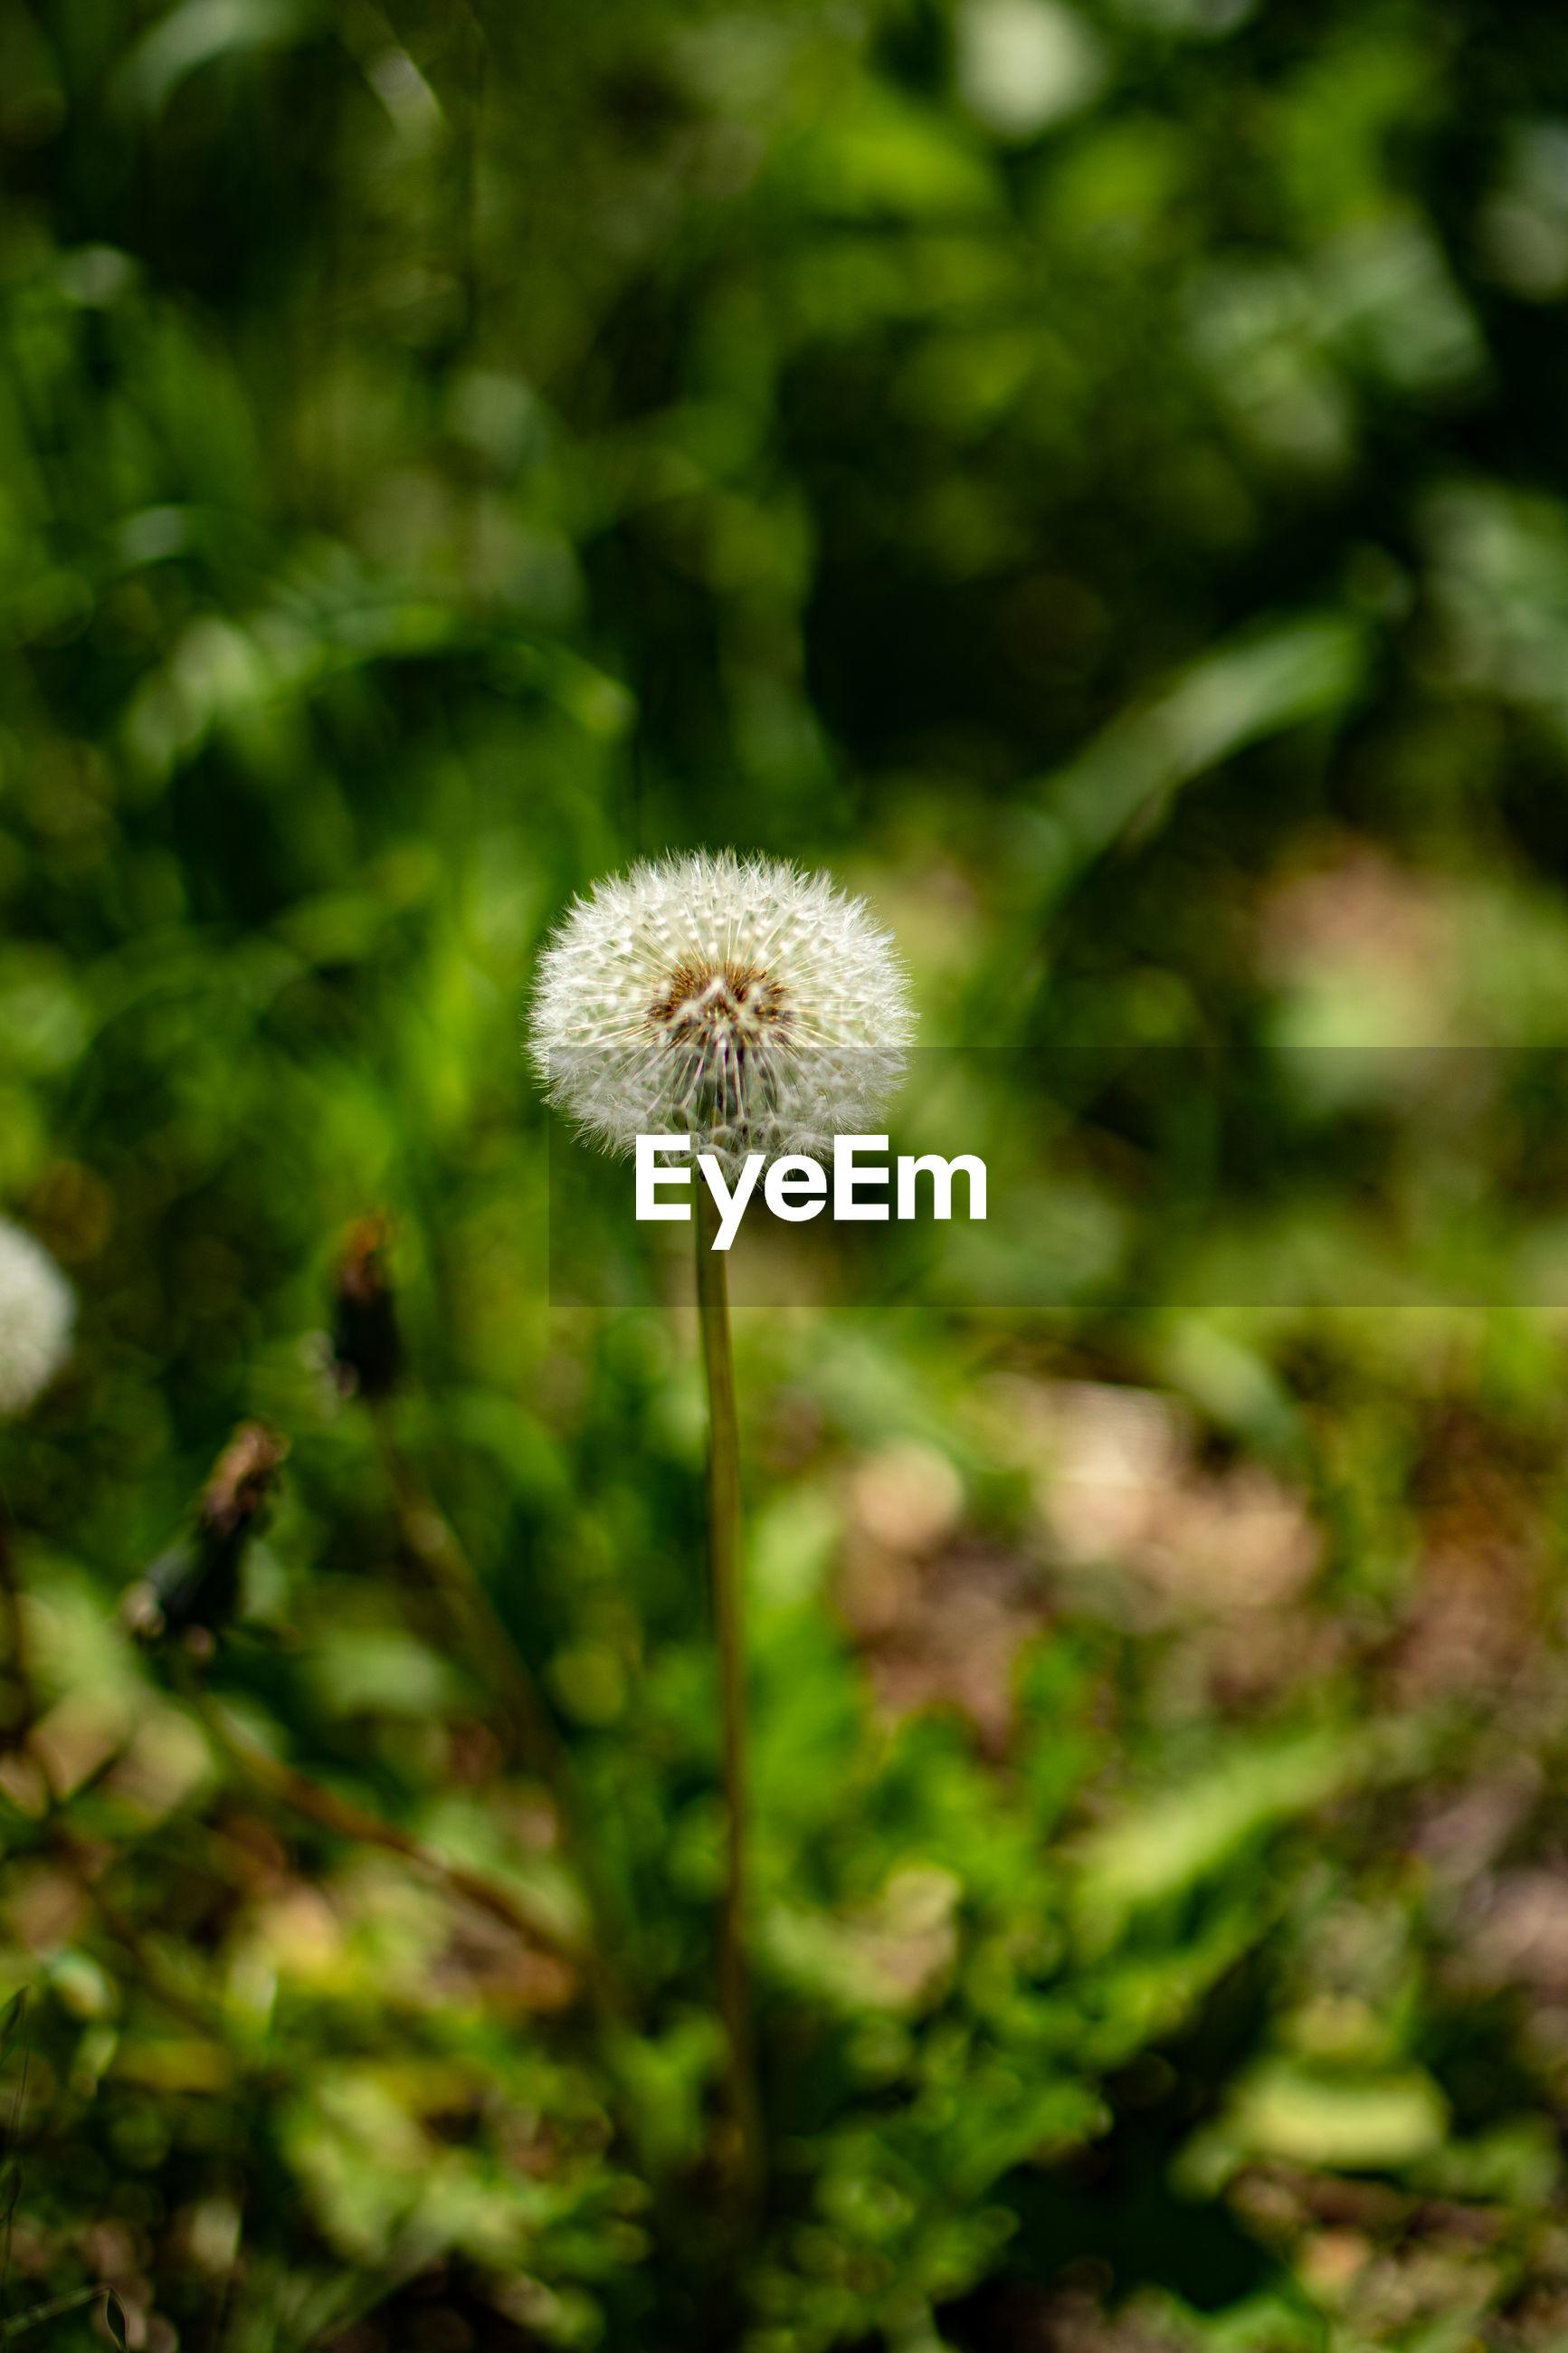 CLOSE-UP OF DANDELION FLOWER GROWING IN FIELD